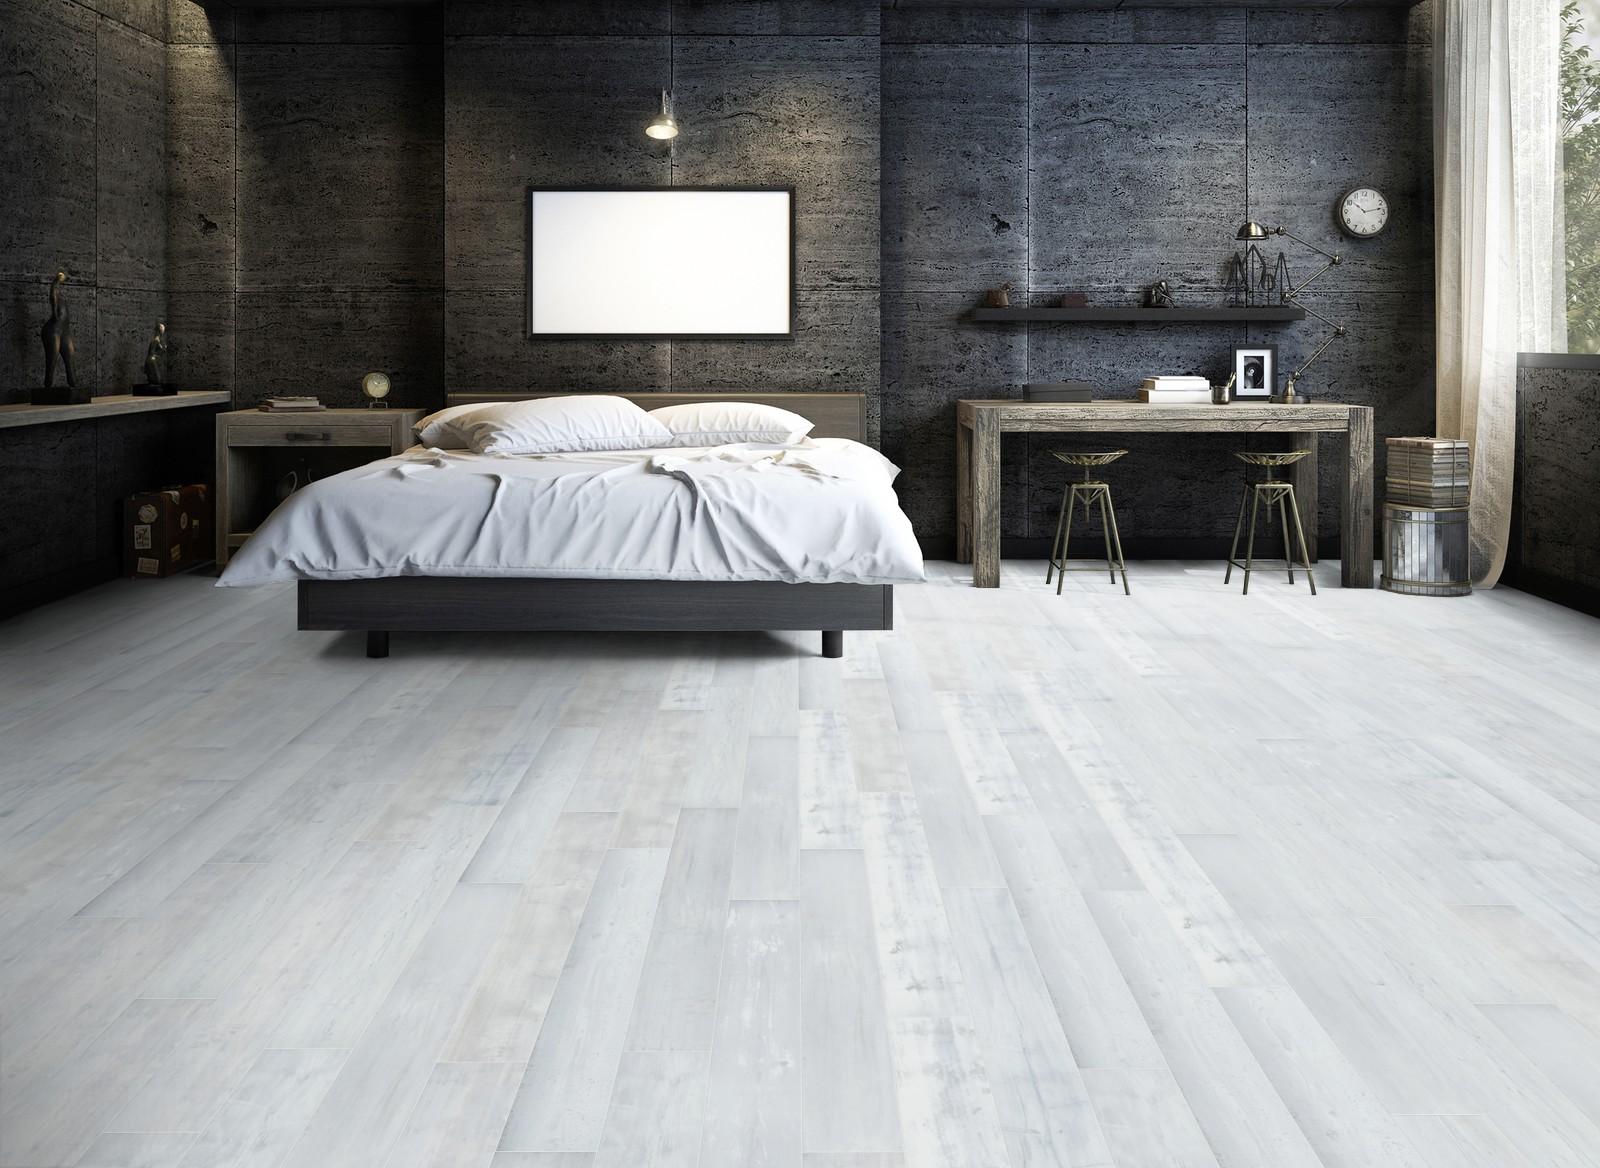 dormitorios-decorados-en-tonos-neutros